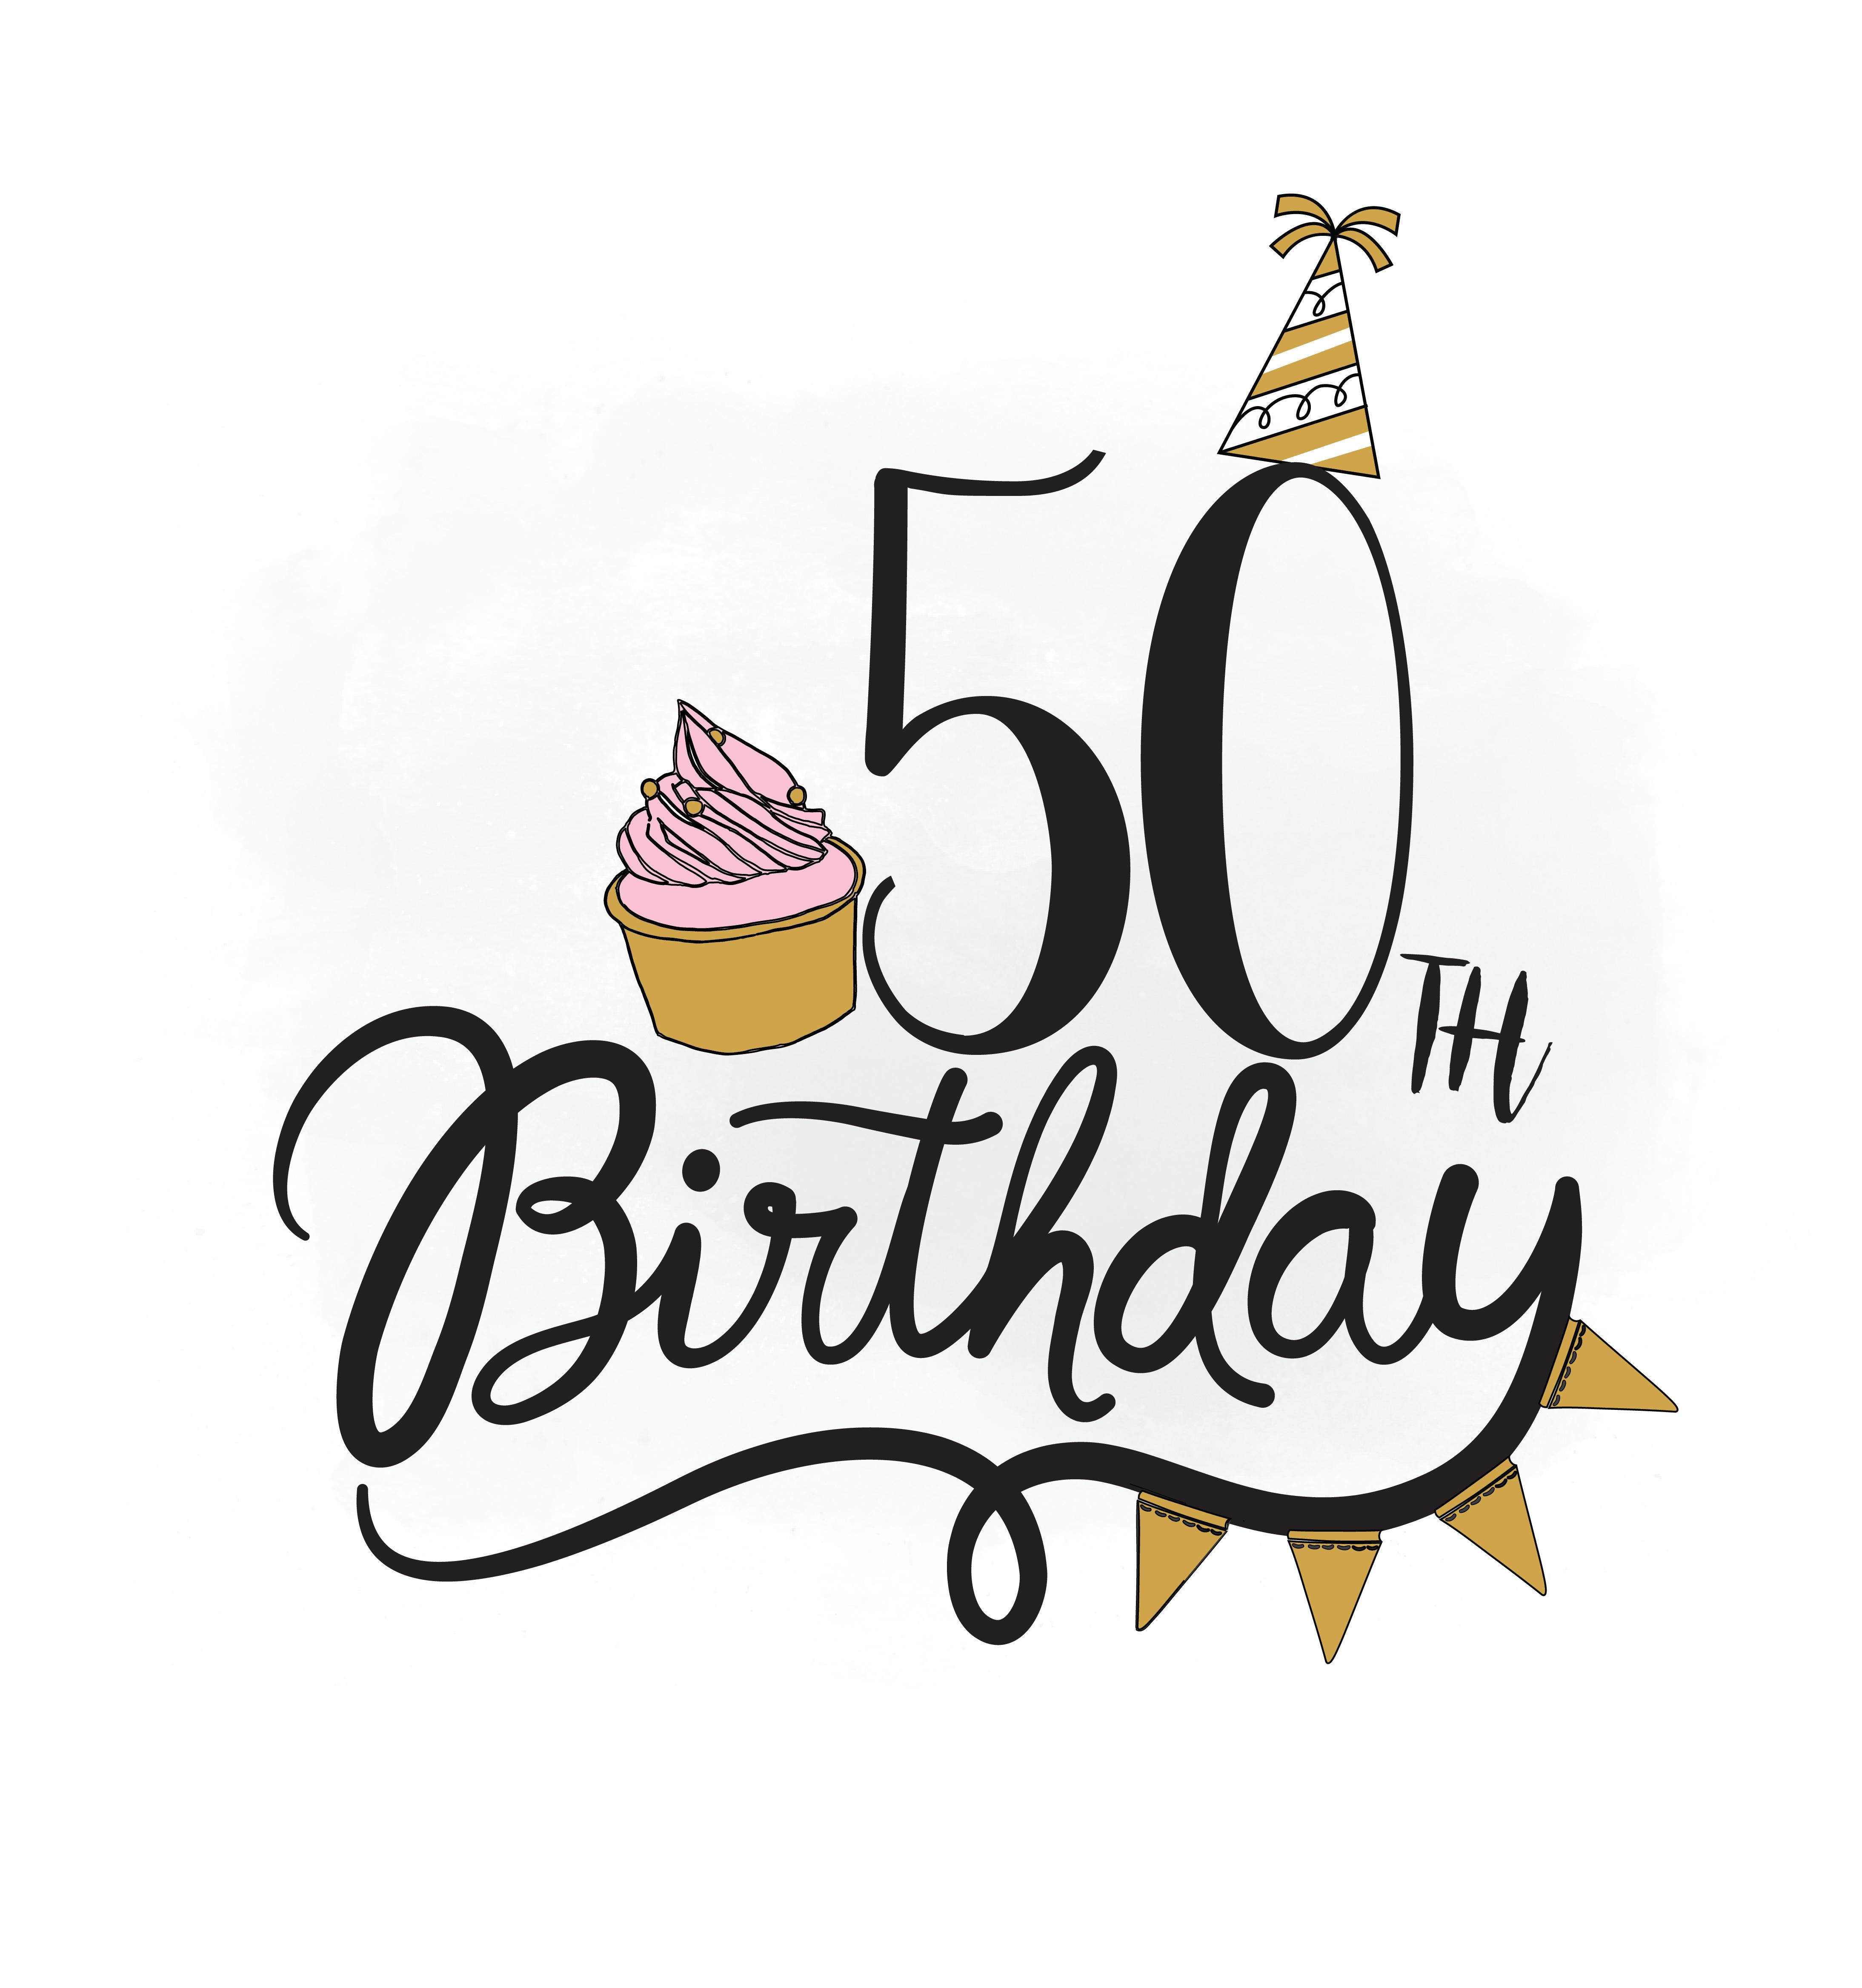 th svg quo. Birthday clipart logo